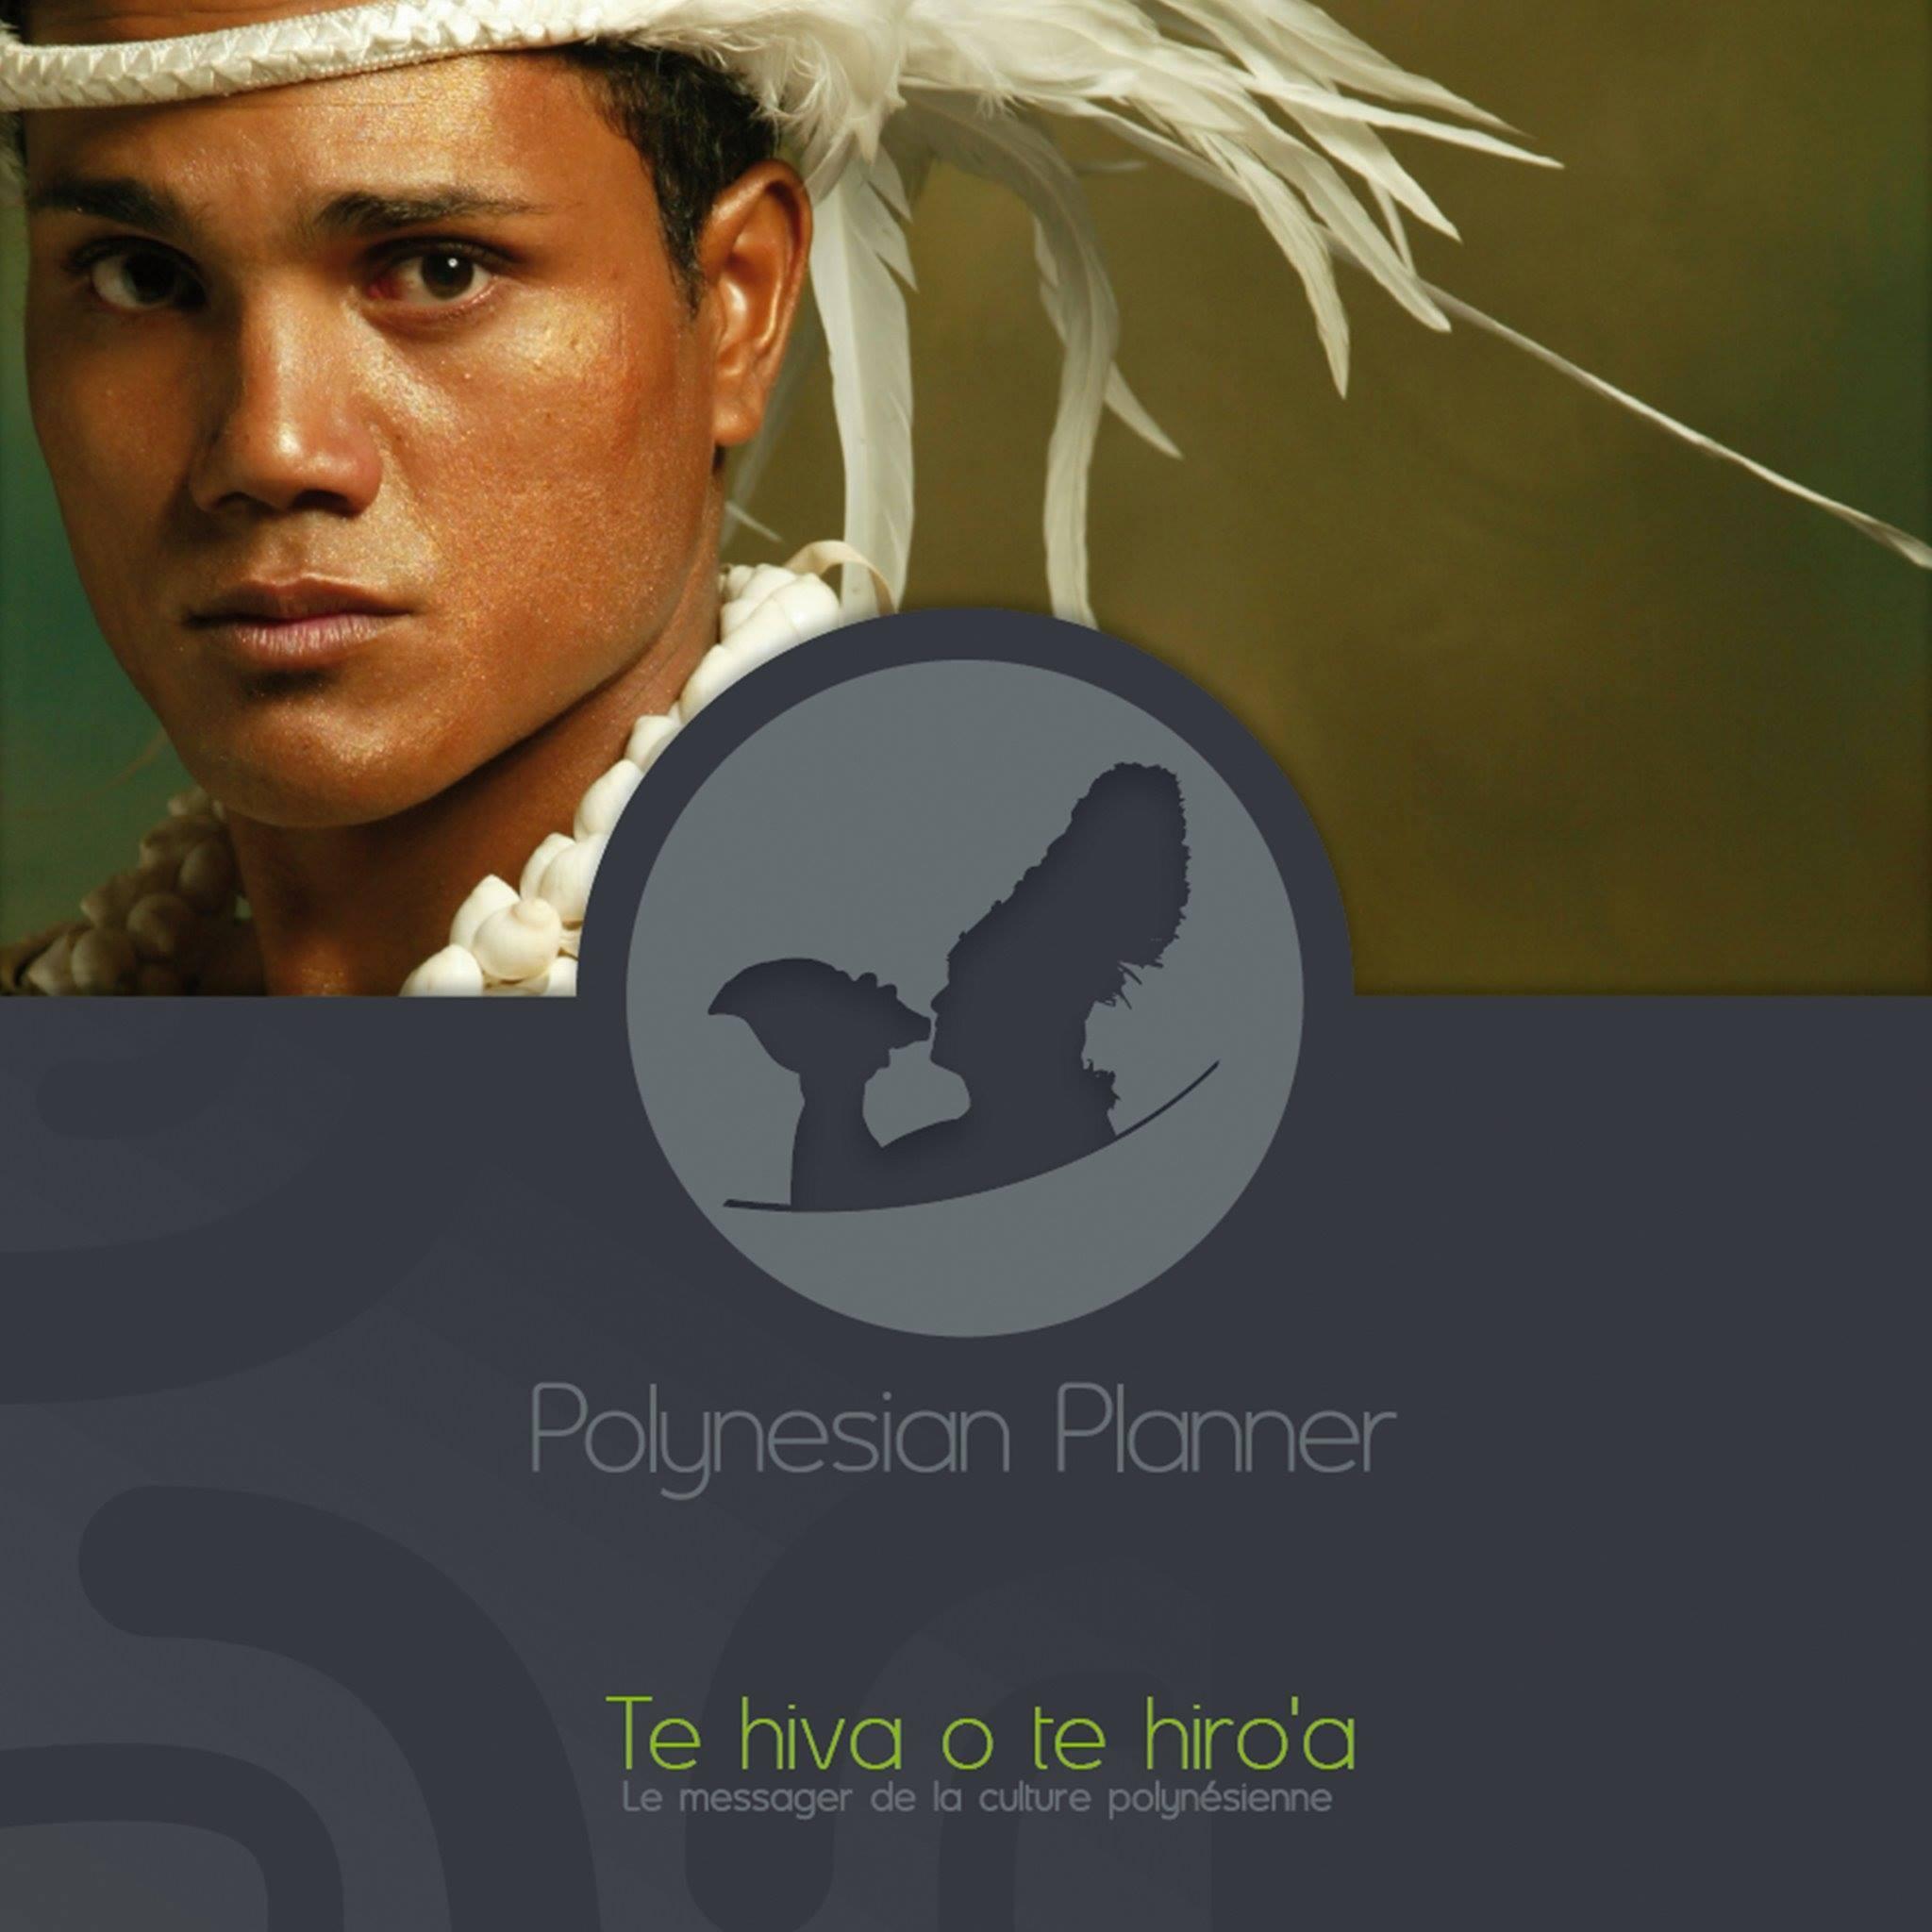 https://tahititourisme.mx/wp-content/uploads/2017/08/polynesianplannerphotodeprofil.jpg